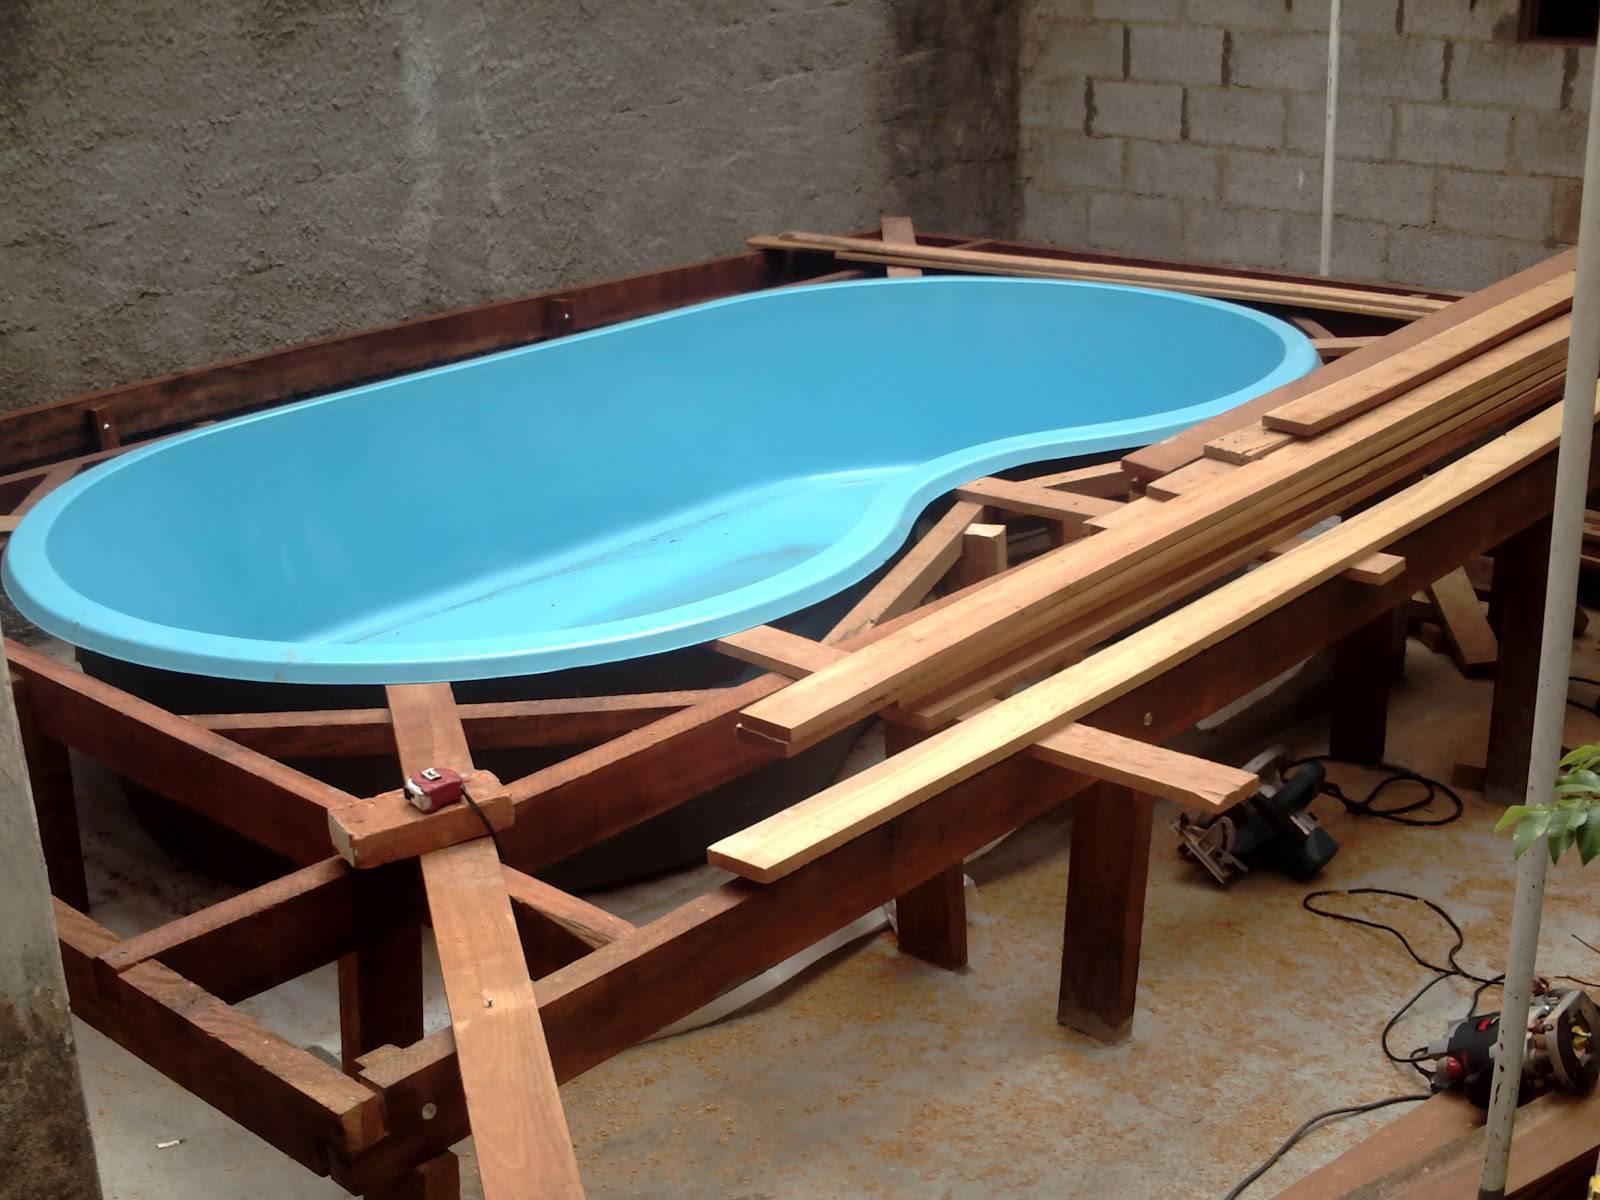 30 fotos de piscina de fibra prepare se para o ver o - Piscinas de montar ...